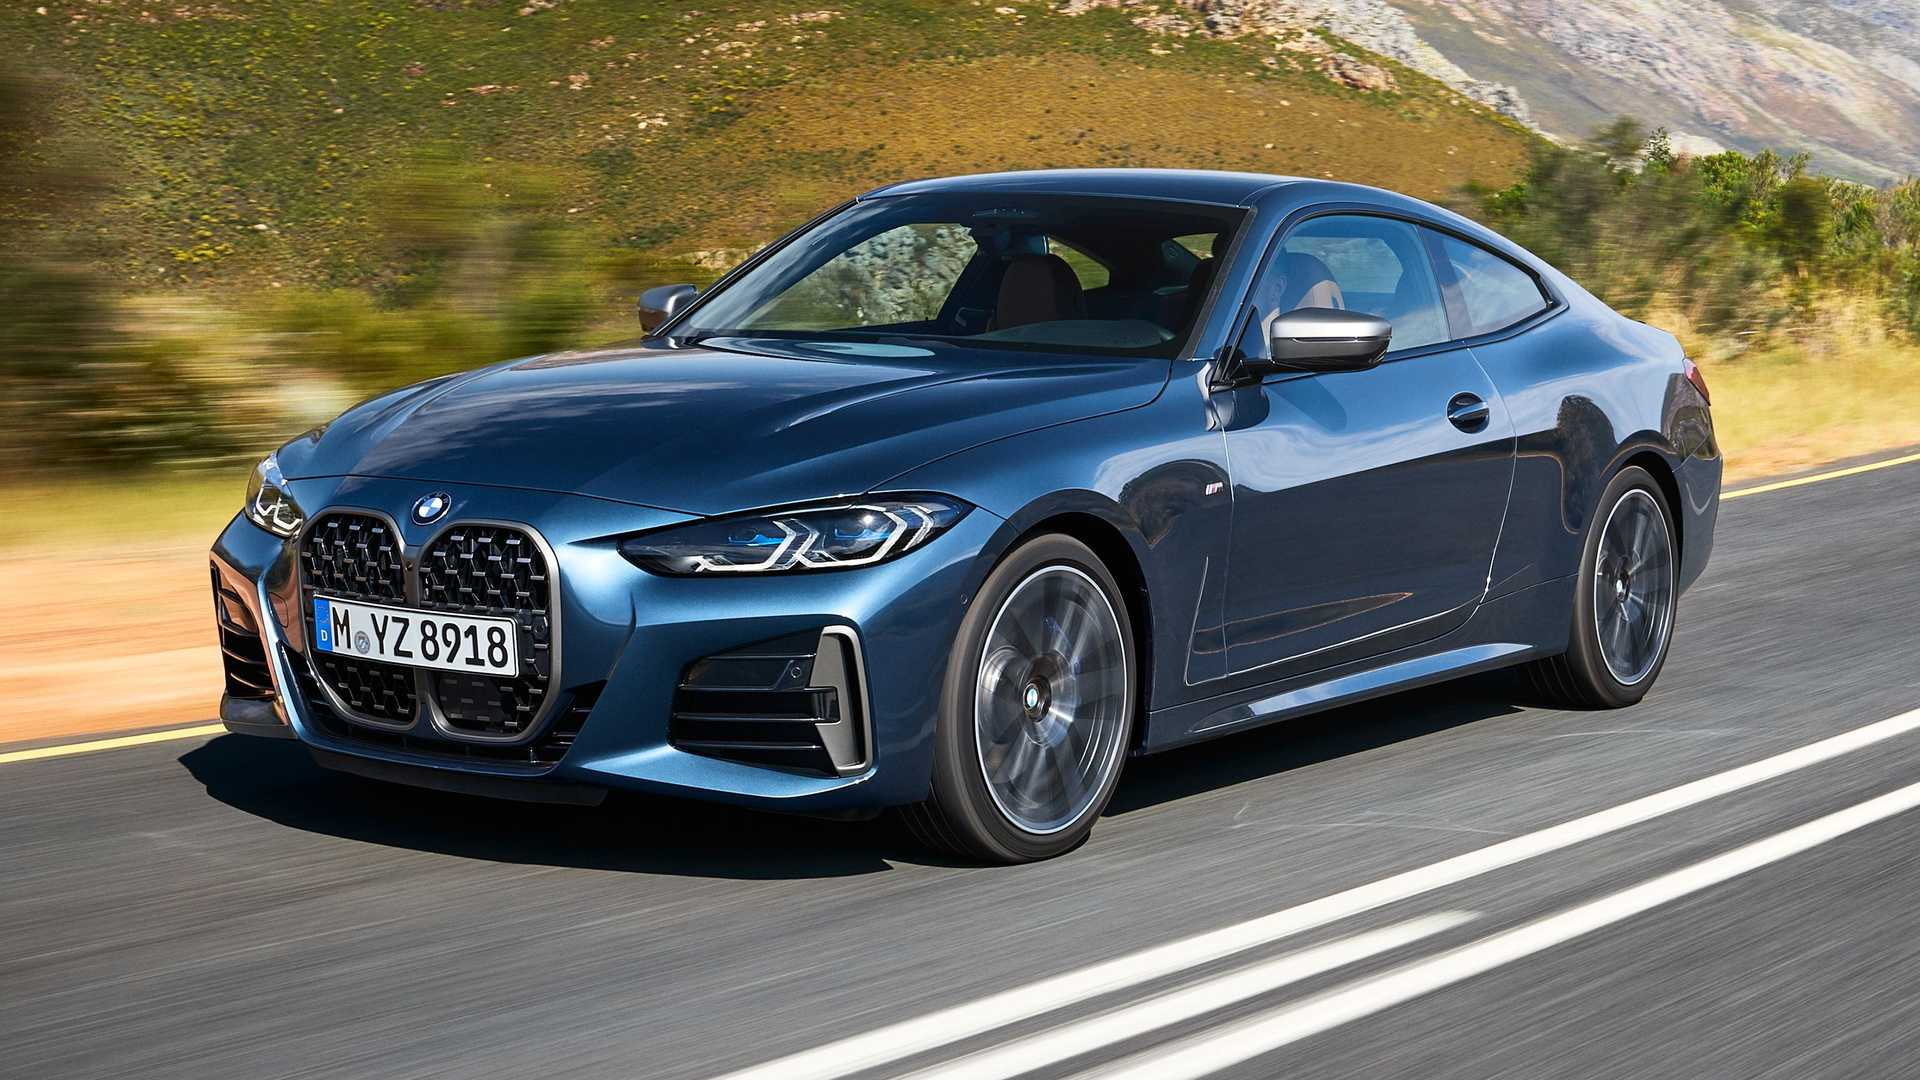 BMW 4 Series: Νέα ντίζελ με 286 και 340 άλογα [pics]